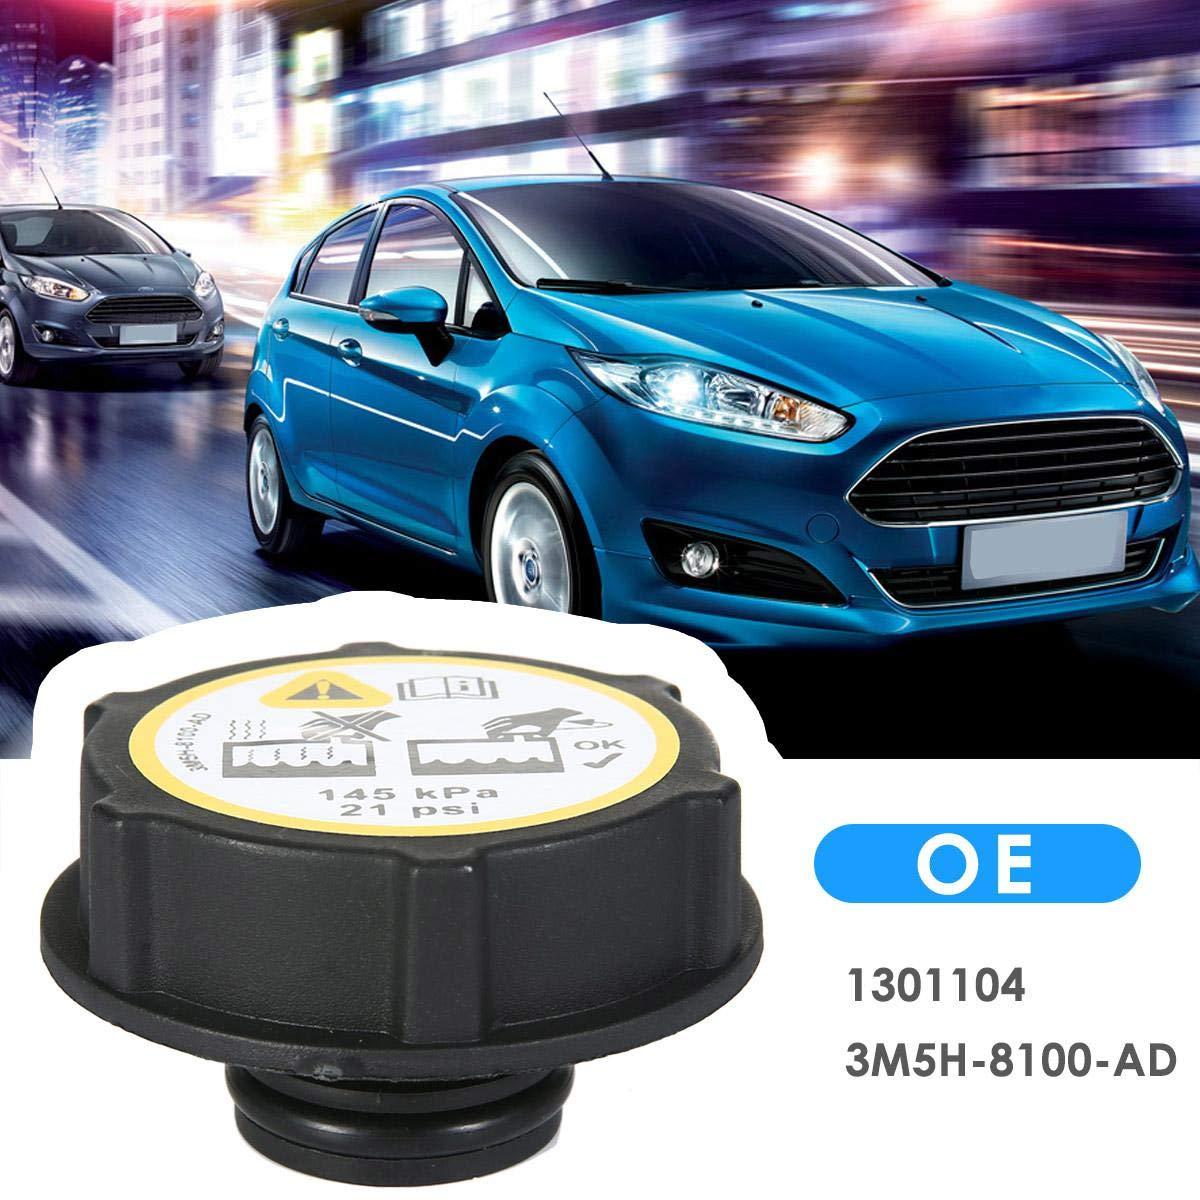 DokFin Tapa de Tanque de Expansi/ón Tapa del Radiador para Ford//Focus//Fiesta//C-MAX//Mondeo//Transit #1301104 3M5H-8100-AD, Negro